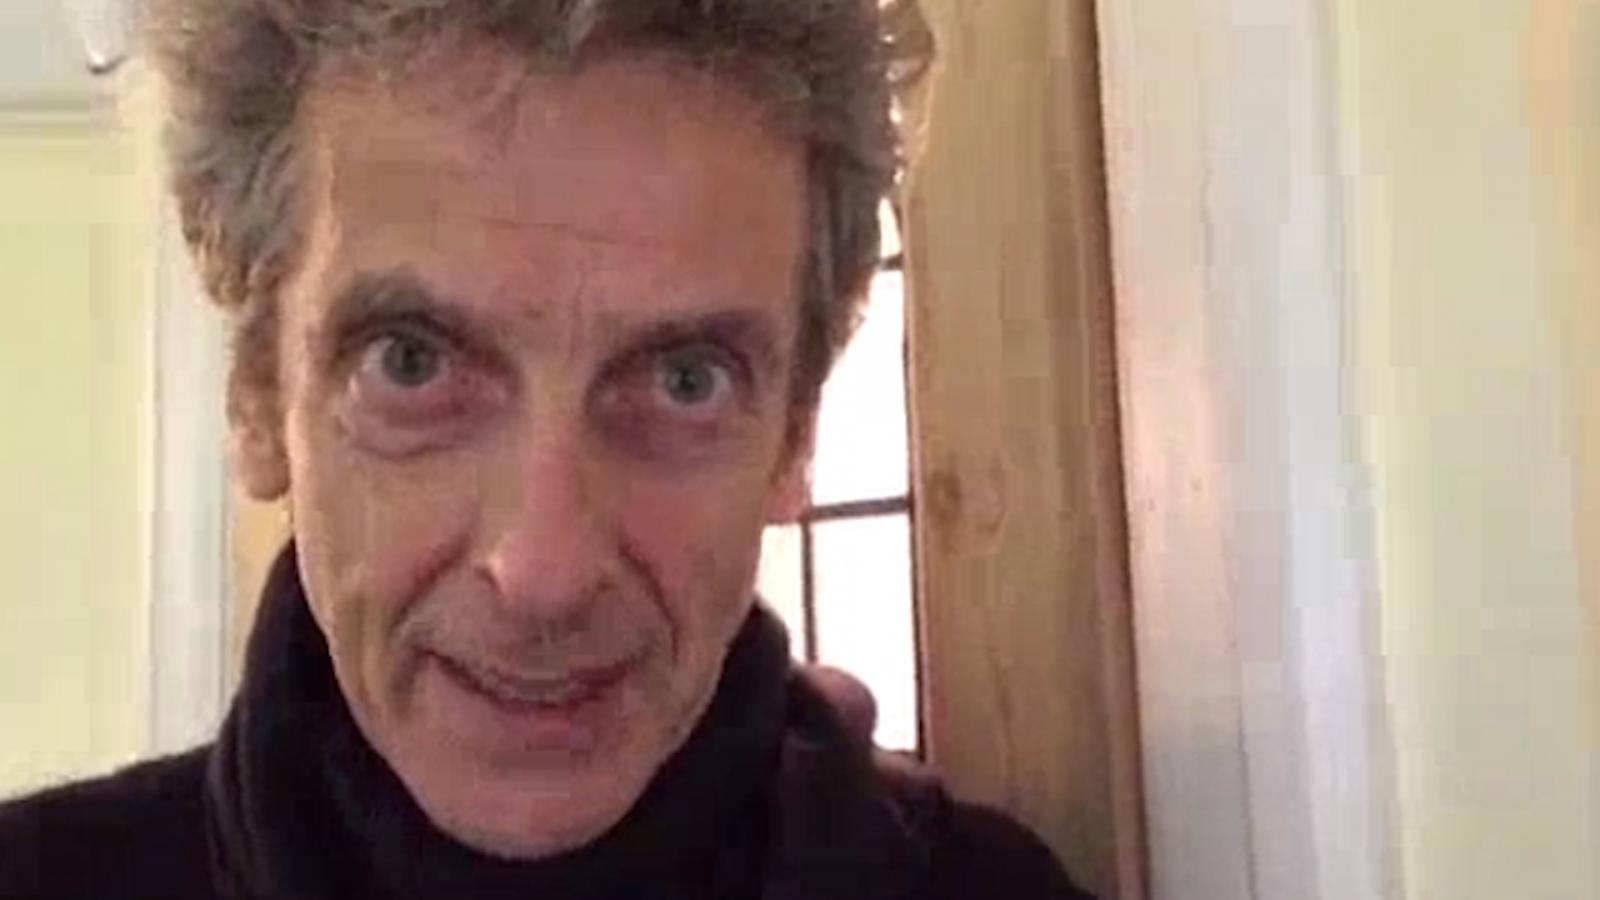 Doctor Who: Peter Capaldi Sends Heartfelt Video Message to Autistic Fan